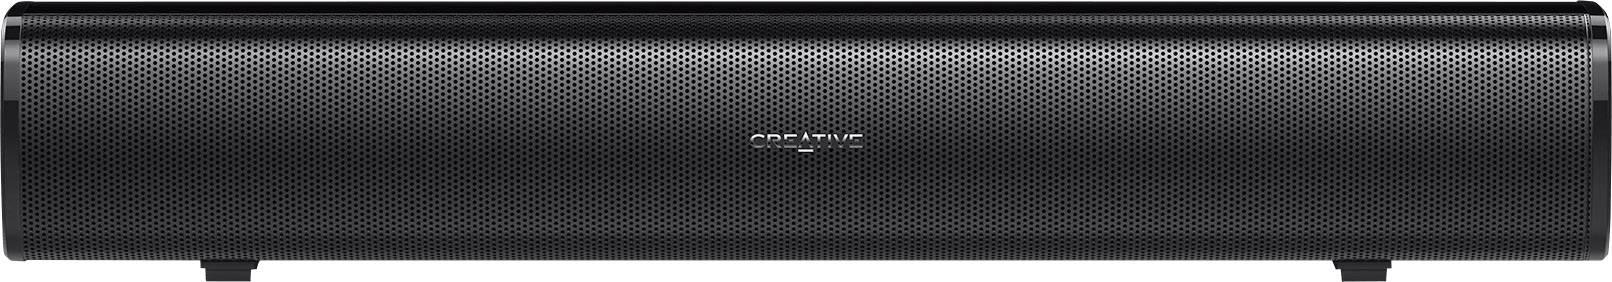 Creative Stage Air 2.1 Altopar